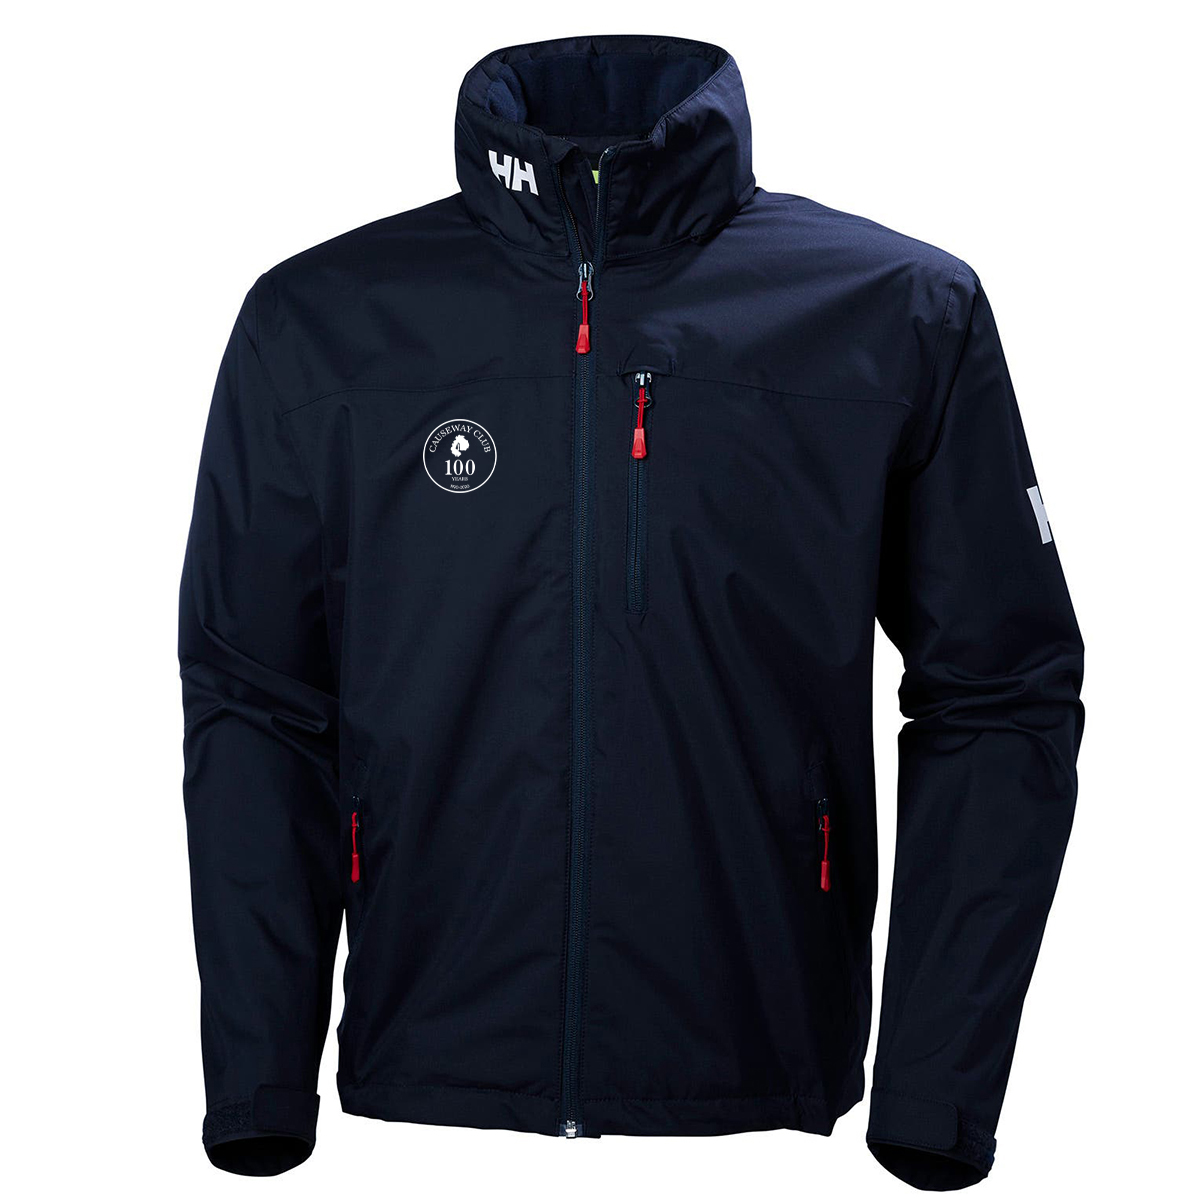 Causeway Club - Men's Helly Hansen Hooded Crew Jacket